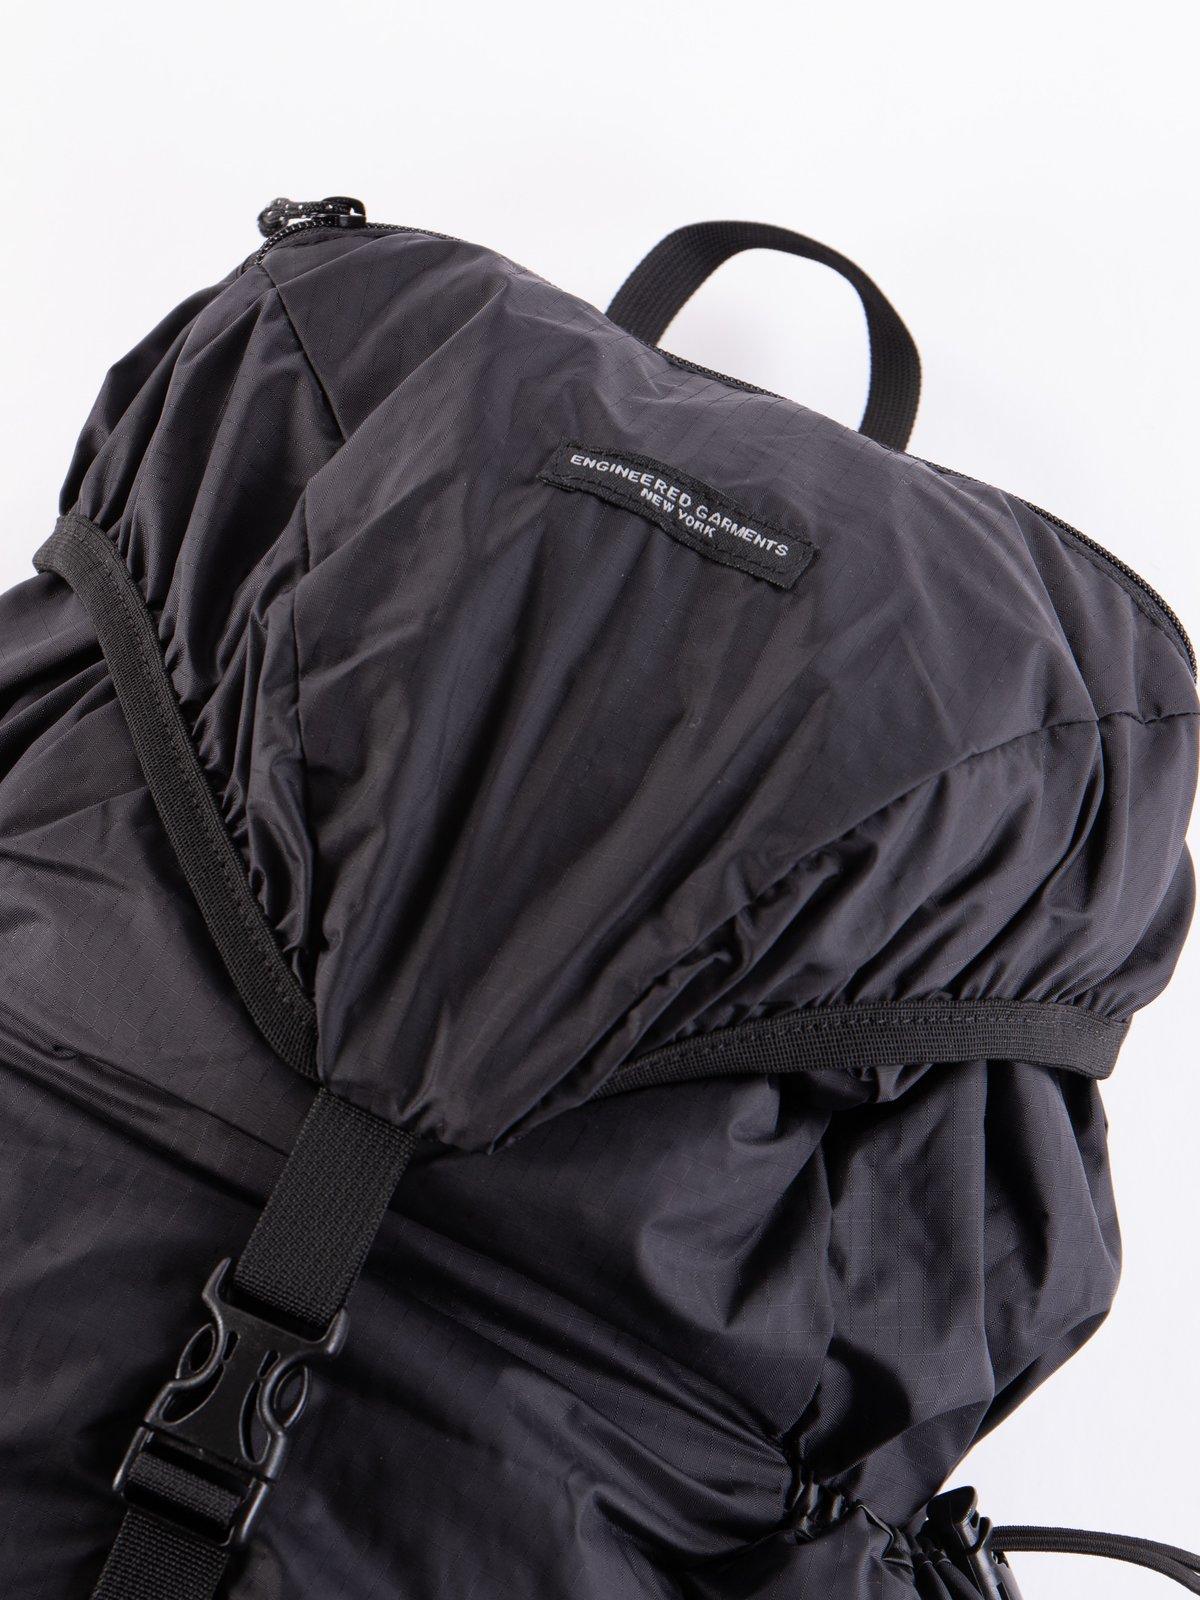 Black Nylon Ripstop UL Backpack - Image 2